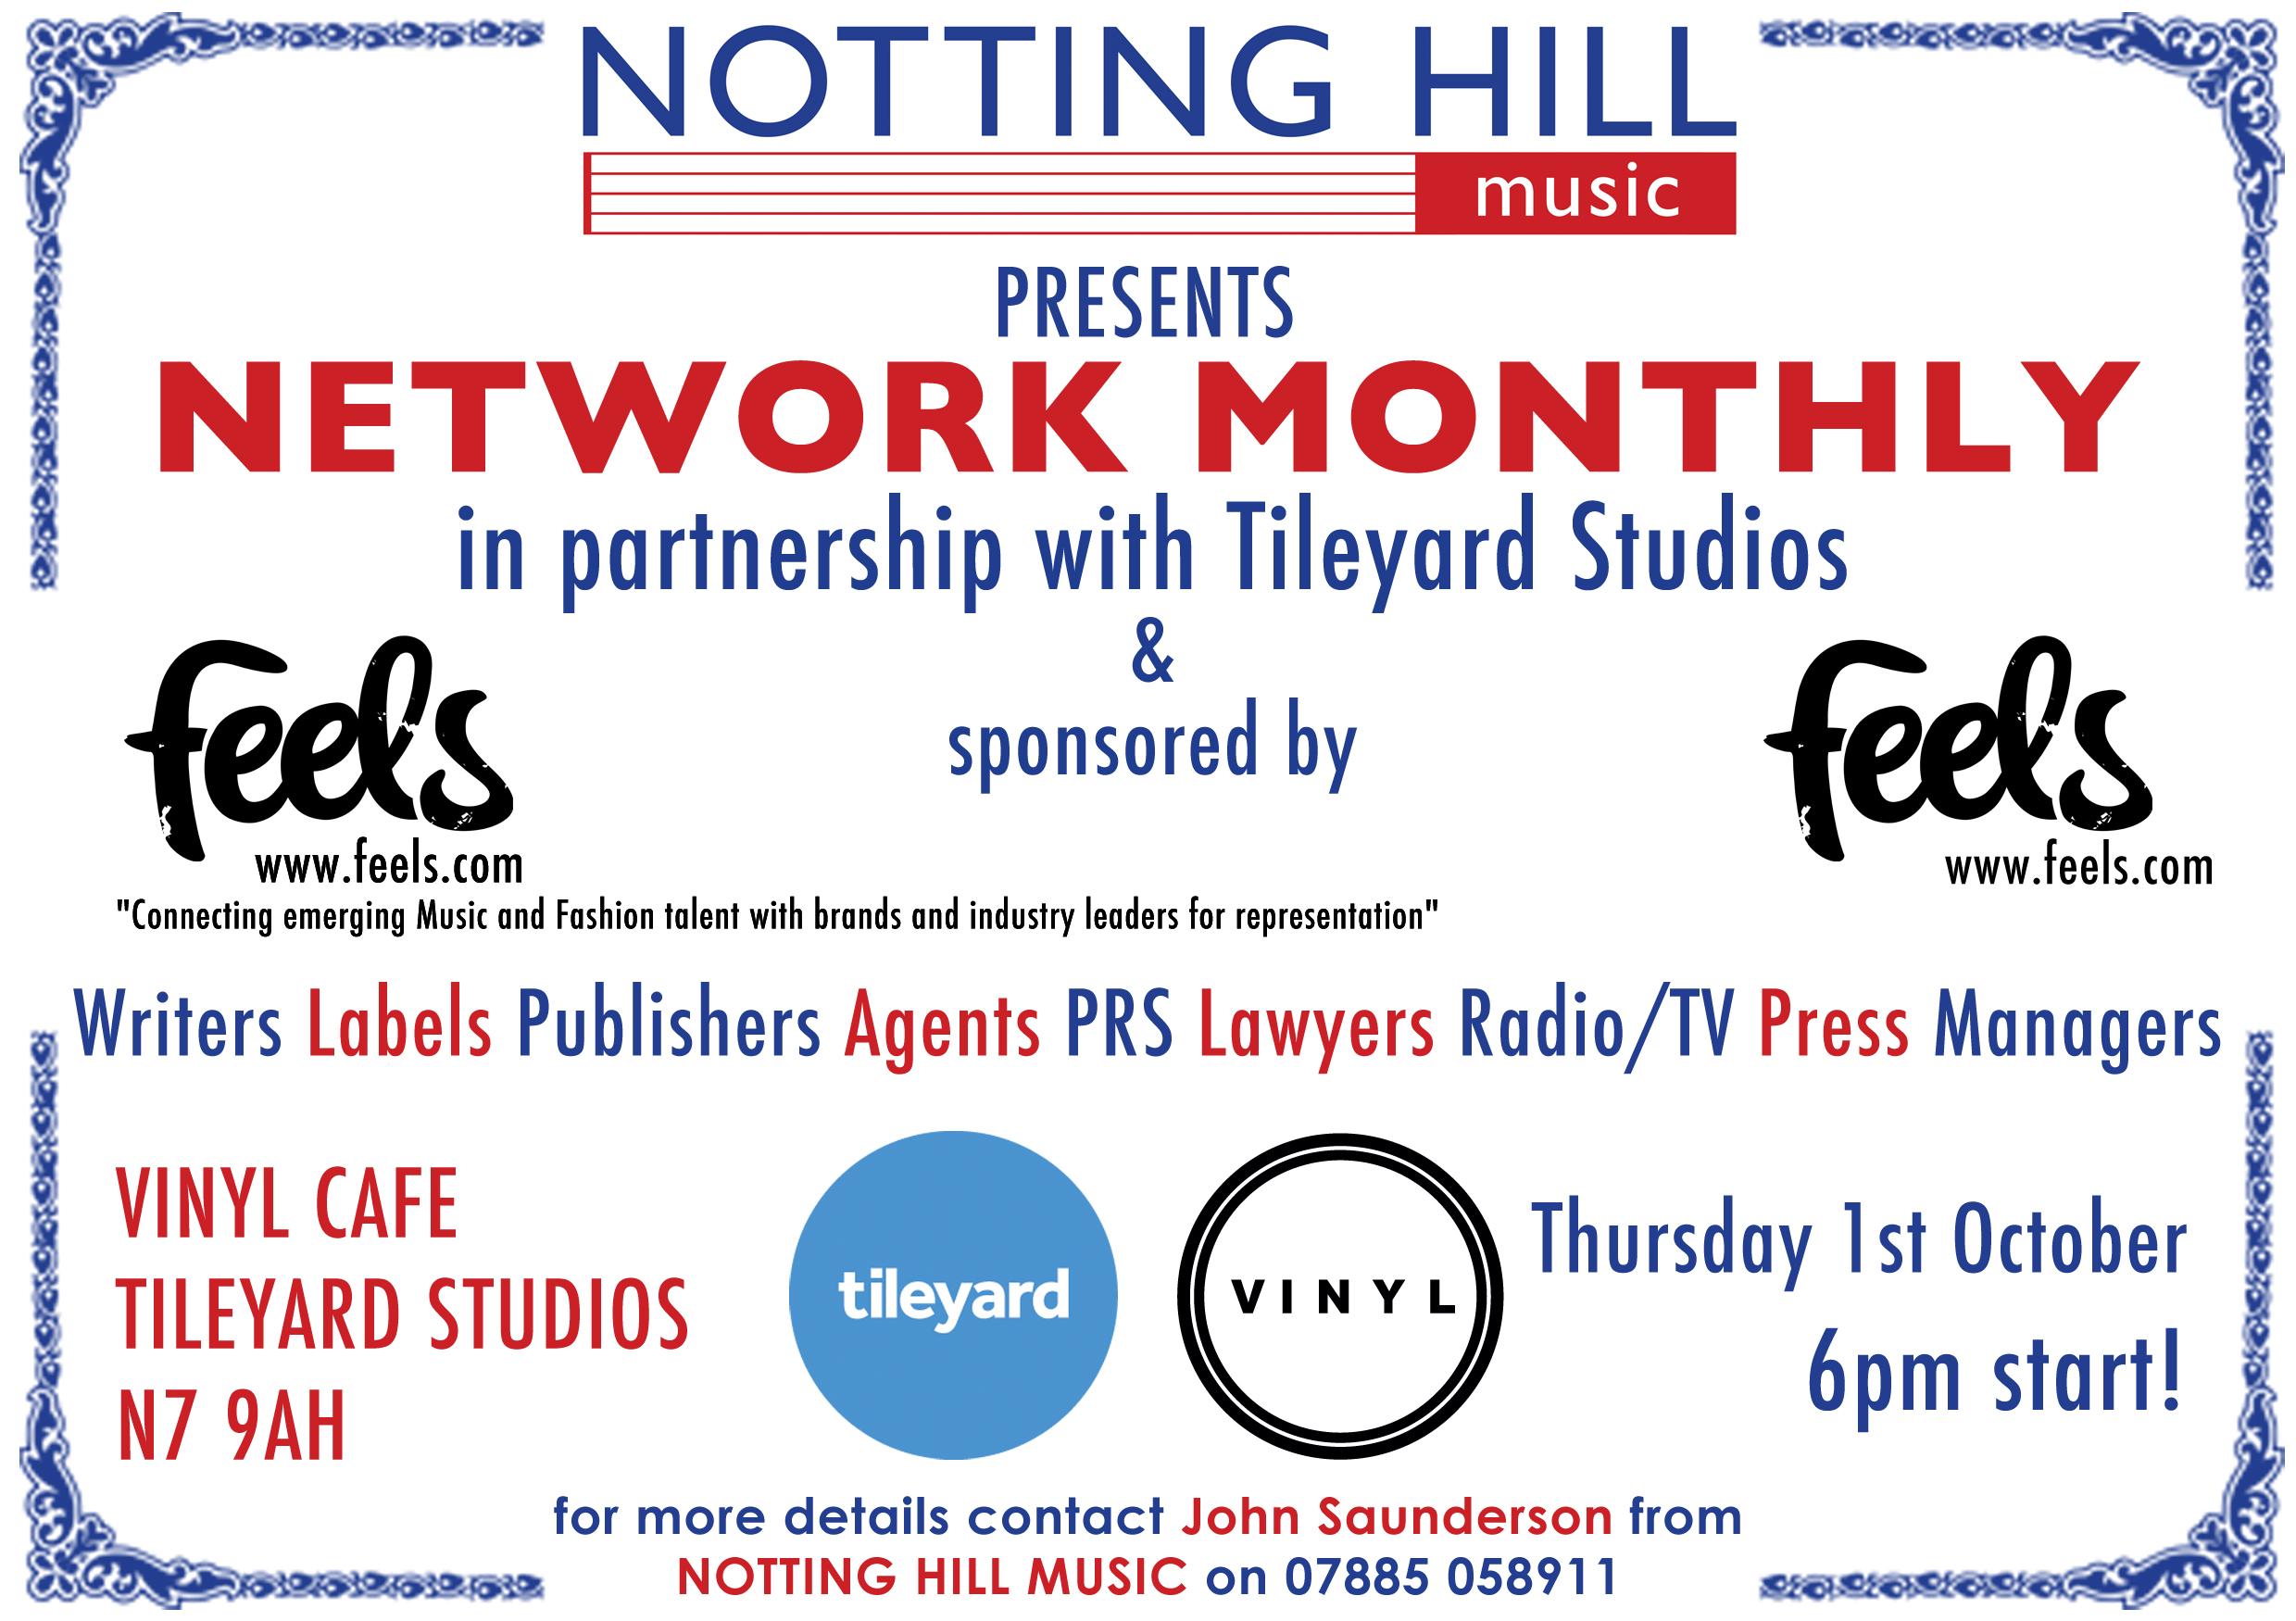 NHM / Tileyard Studios Network Monthly